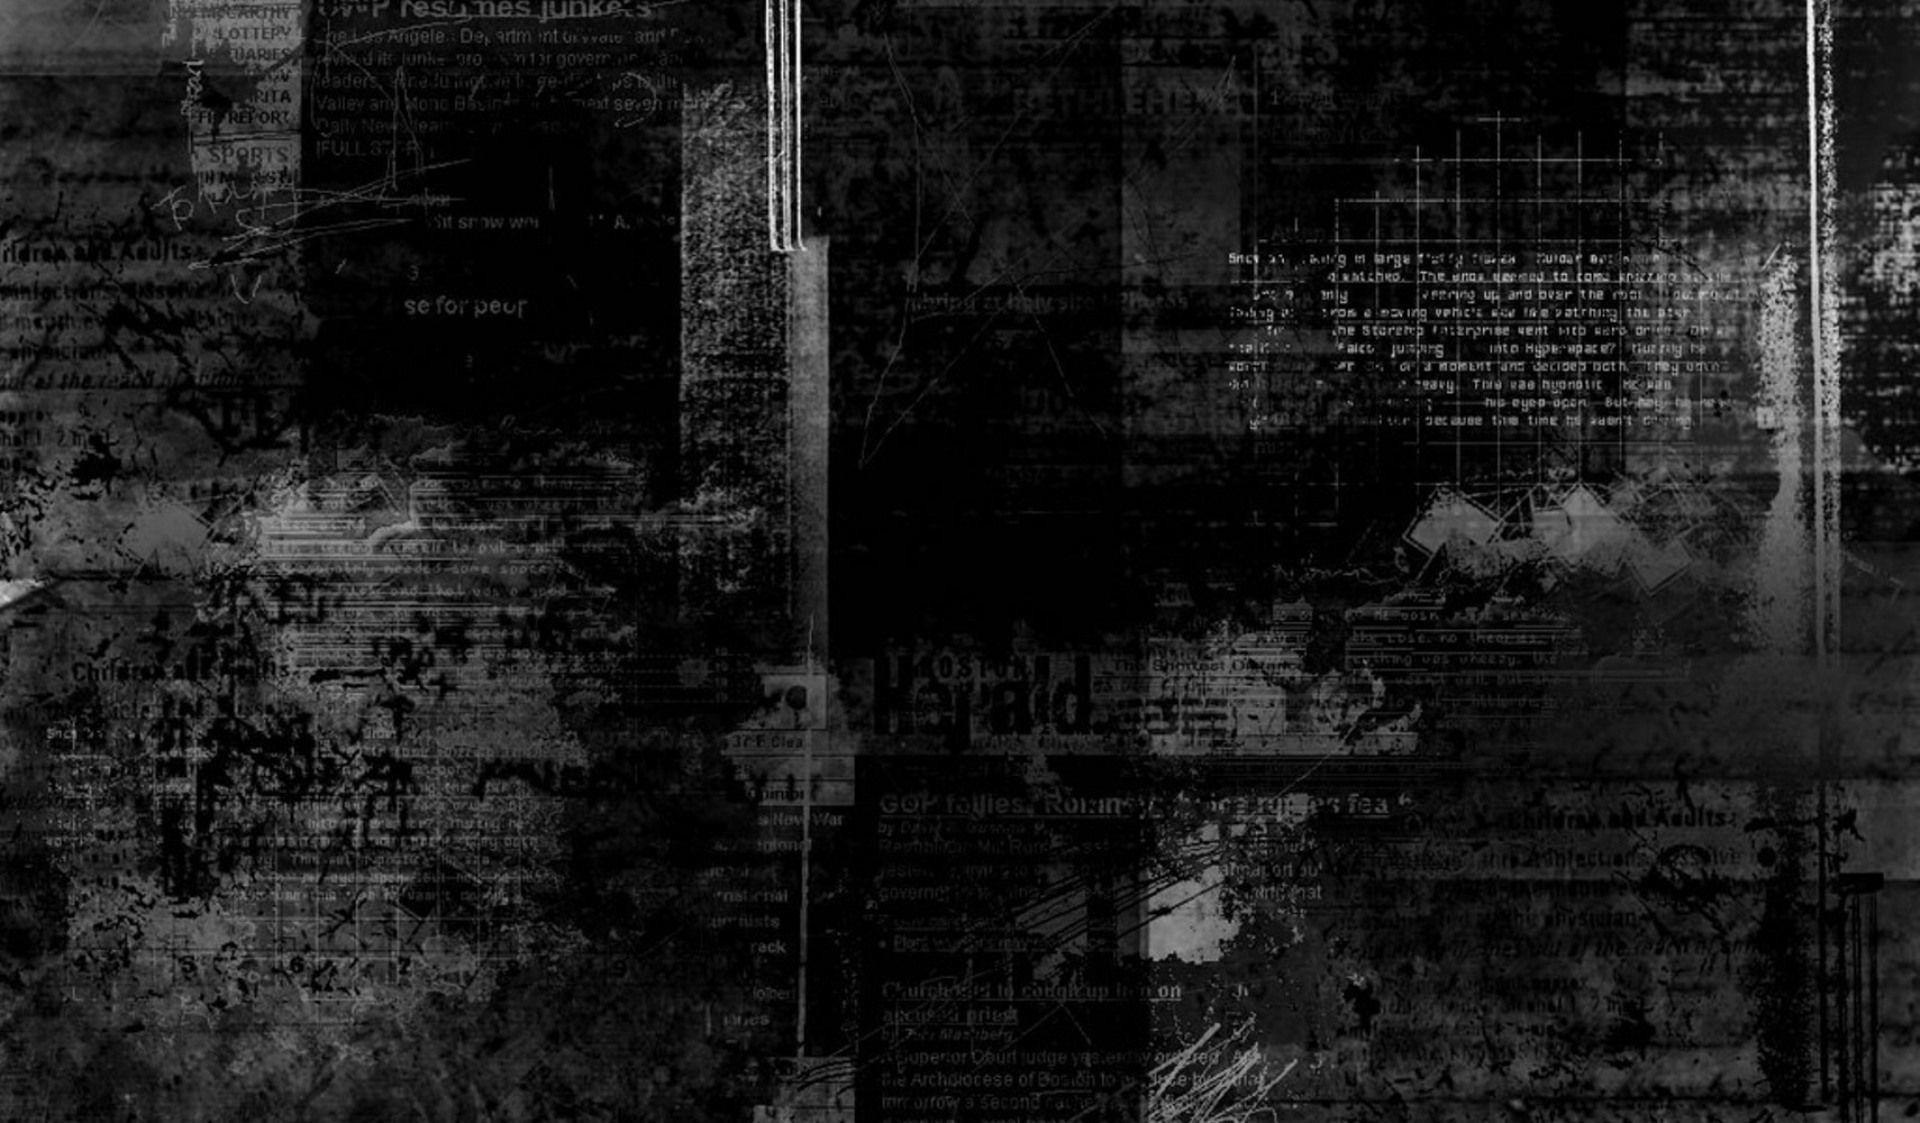 Hd Dark Abstract Wallpapers Hd Desktop 9 HD Wallpapers | Hdimges.